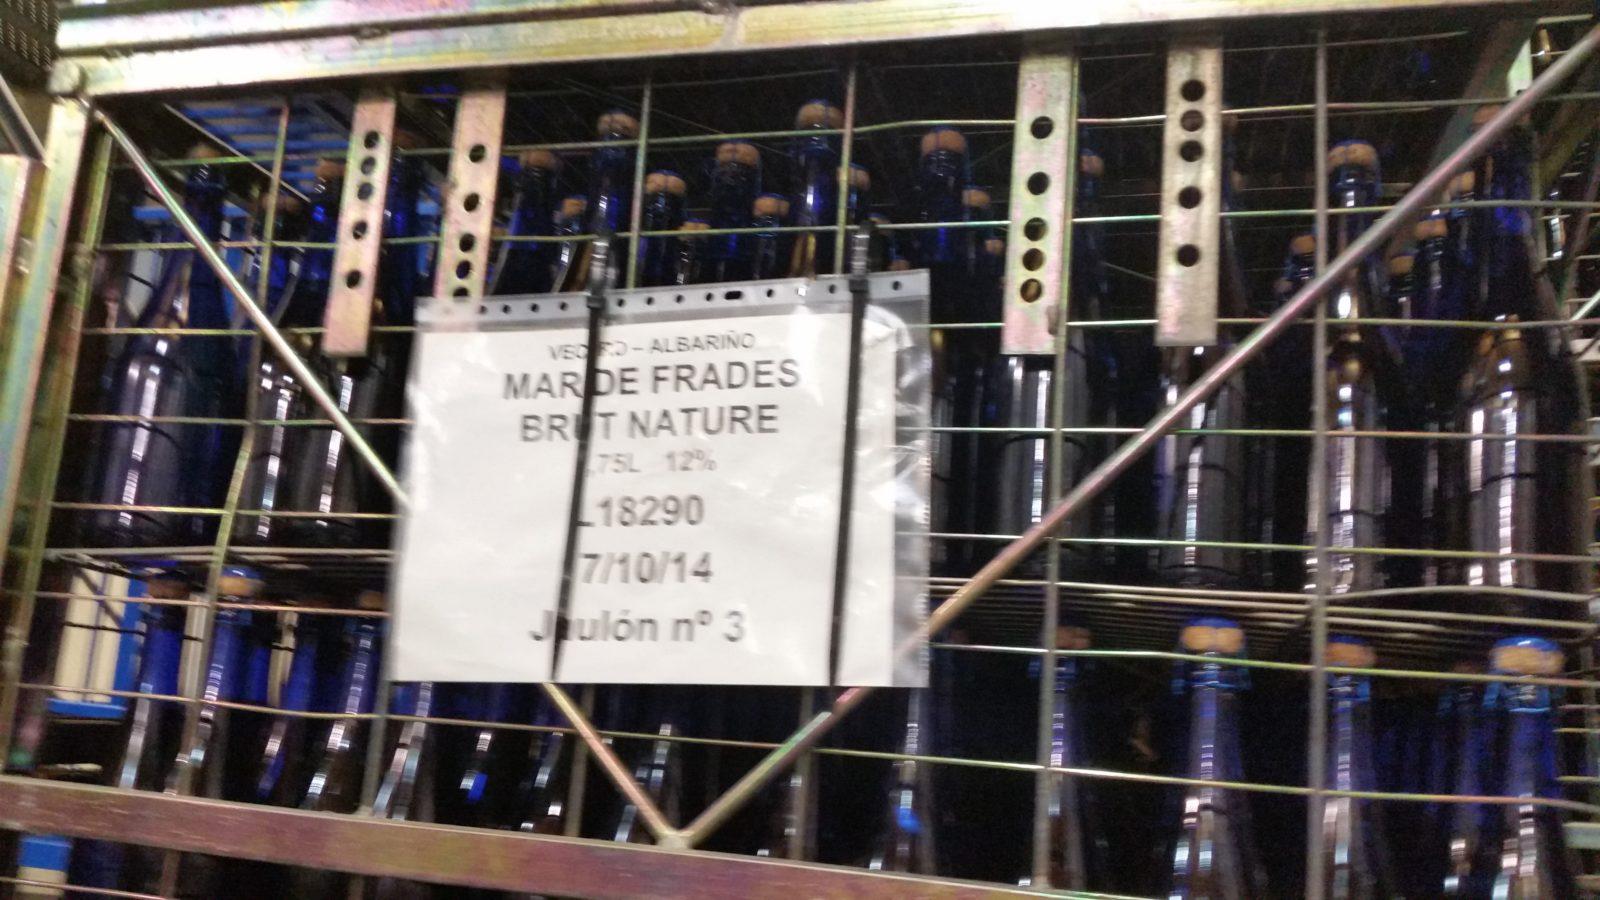 визит на производство в винодельню мар де фрадес